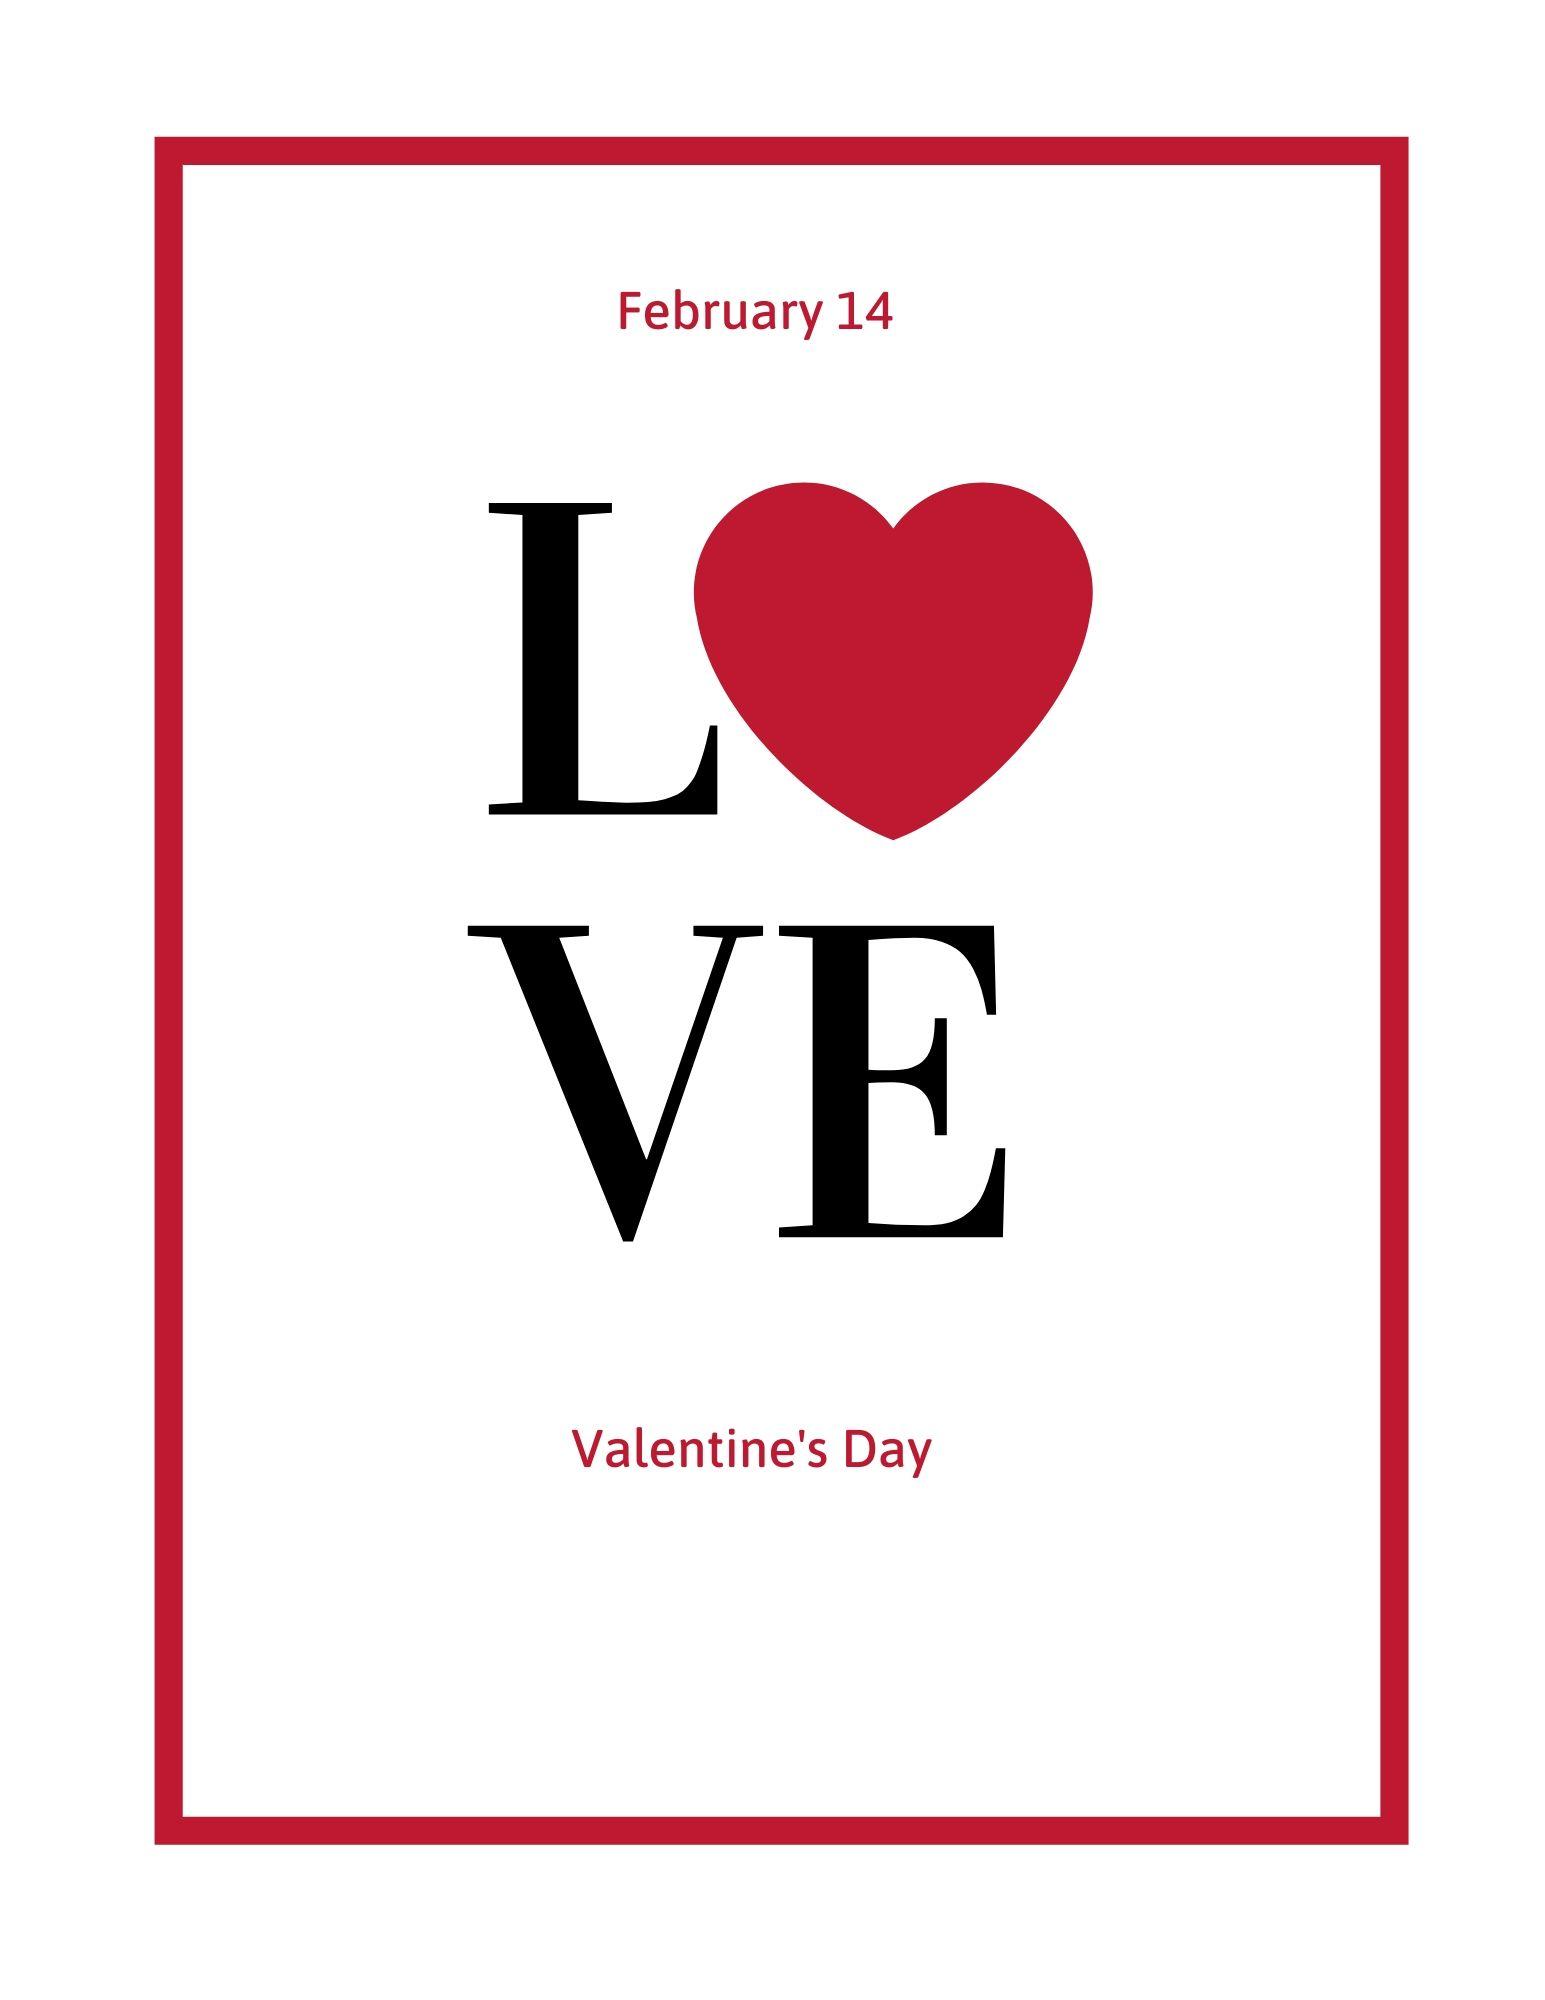 DIY Wall Decor Love 3 #ValentinesDay #ValentineWallArt #DIY #WallArt #DIYDecor